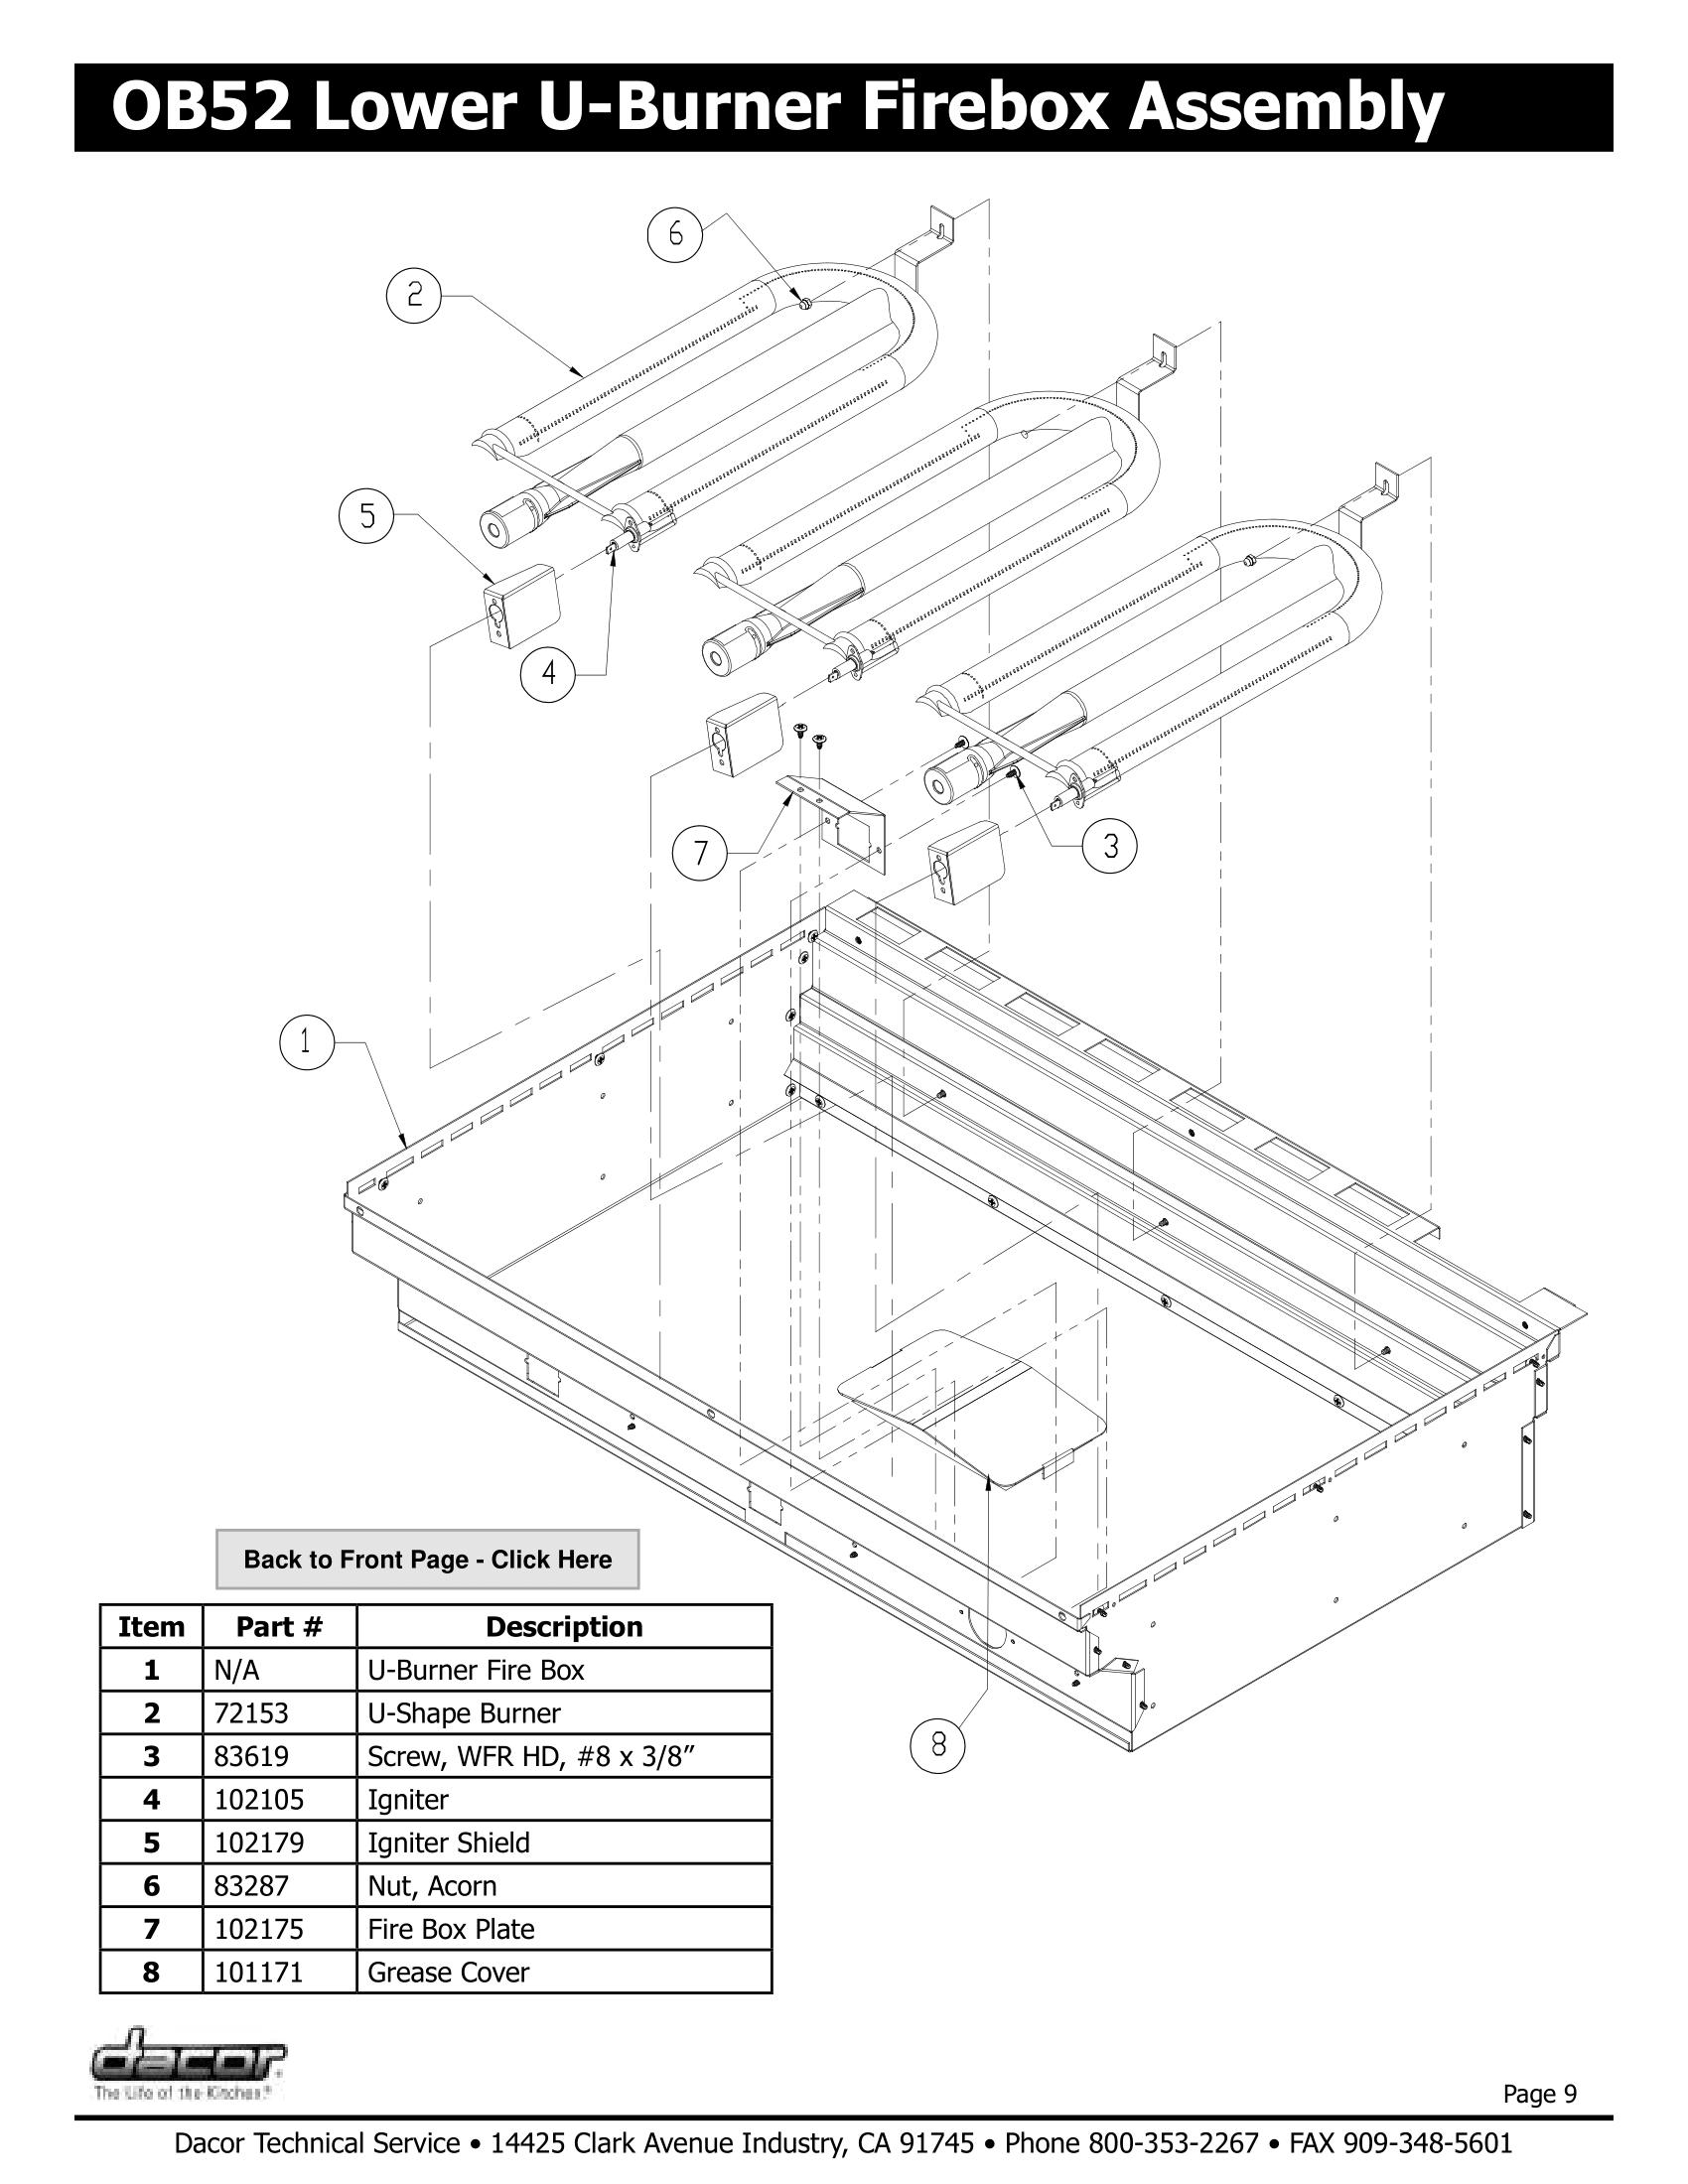 Dacor OB52 Lower U-Burner Firebox Assembly Schematic